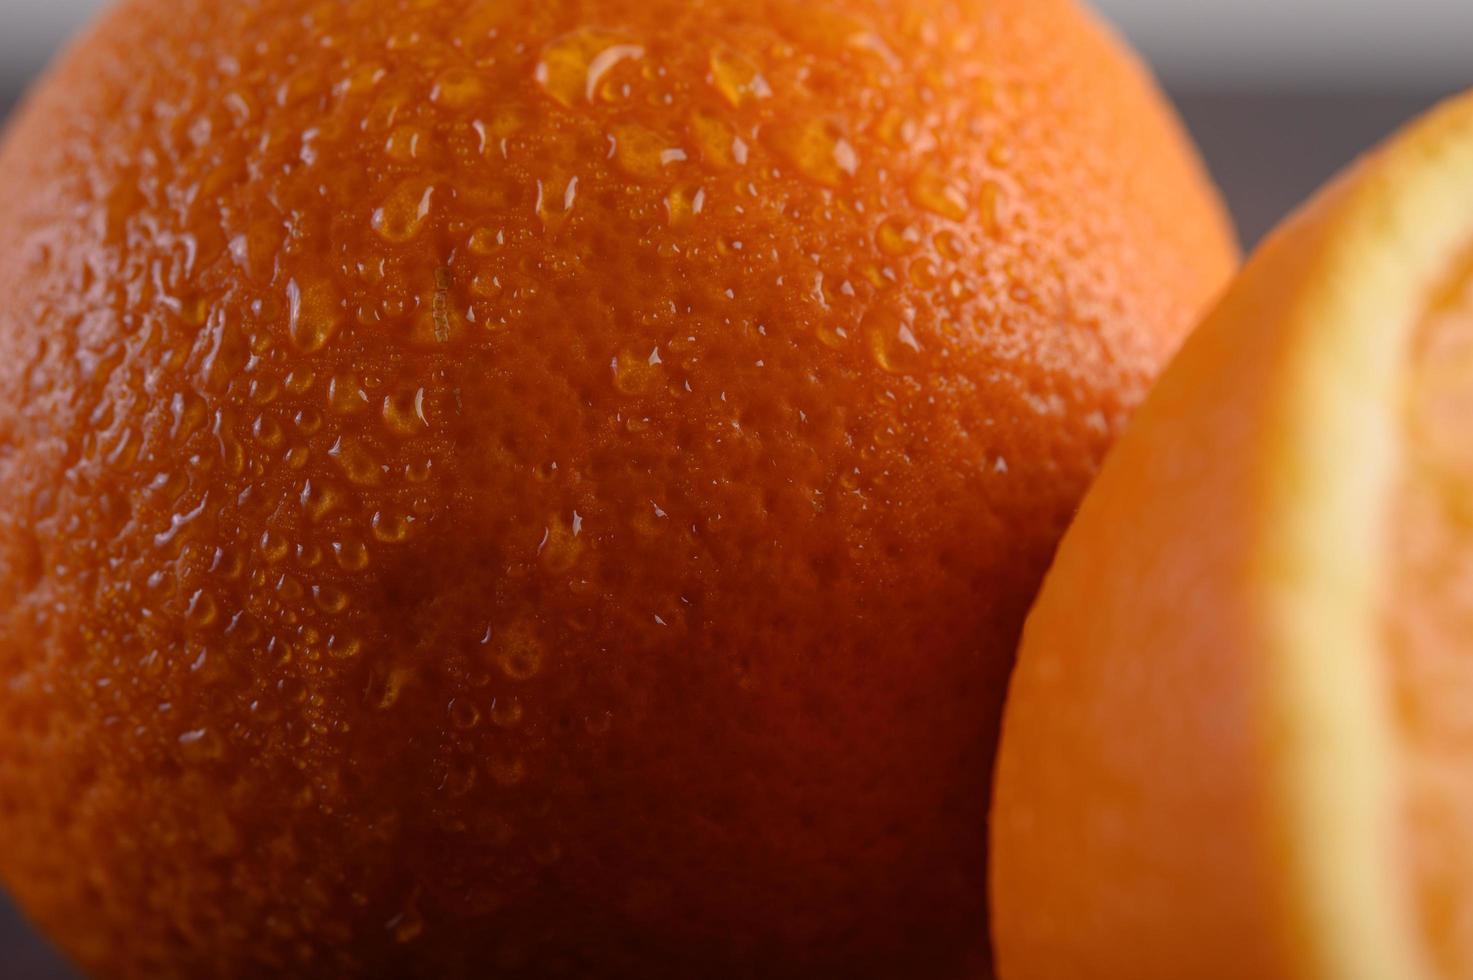 Macro image of ripe orange with small depth of field photo